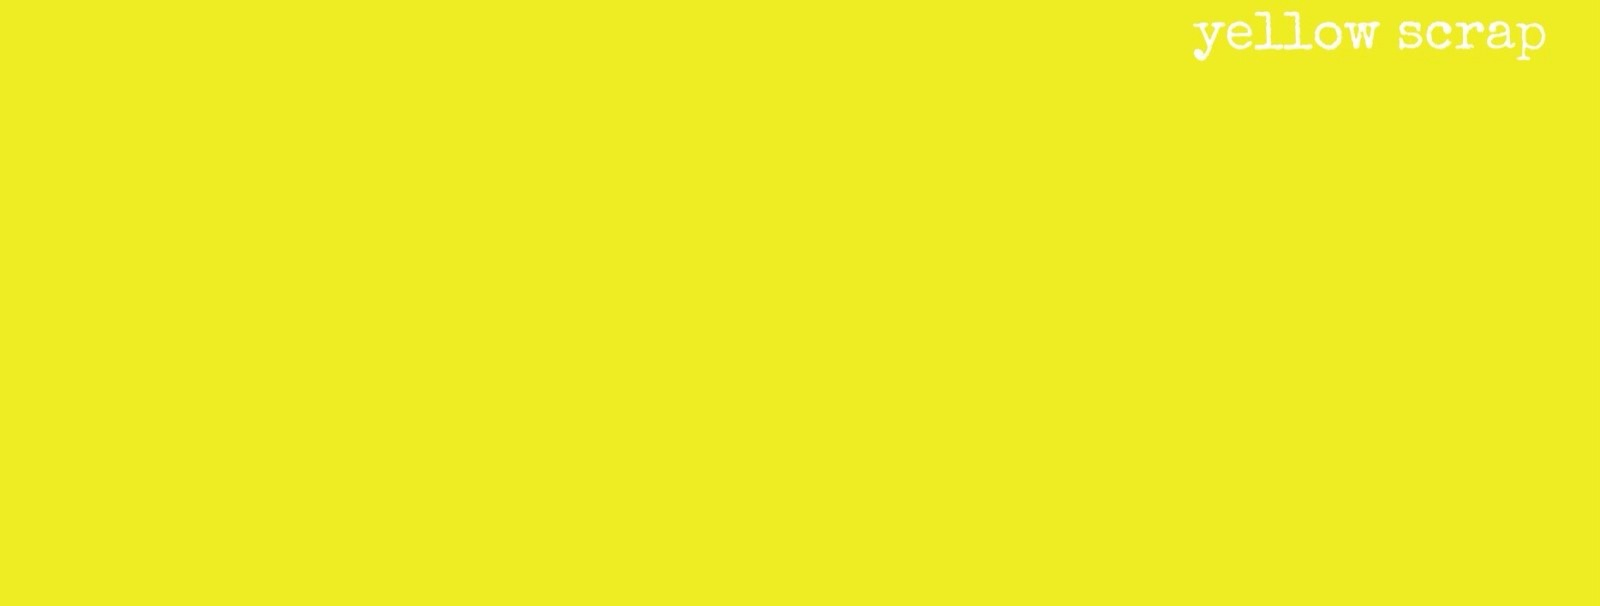 --- yellow scrap ---